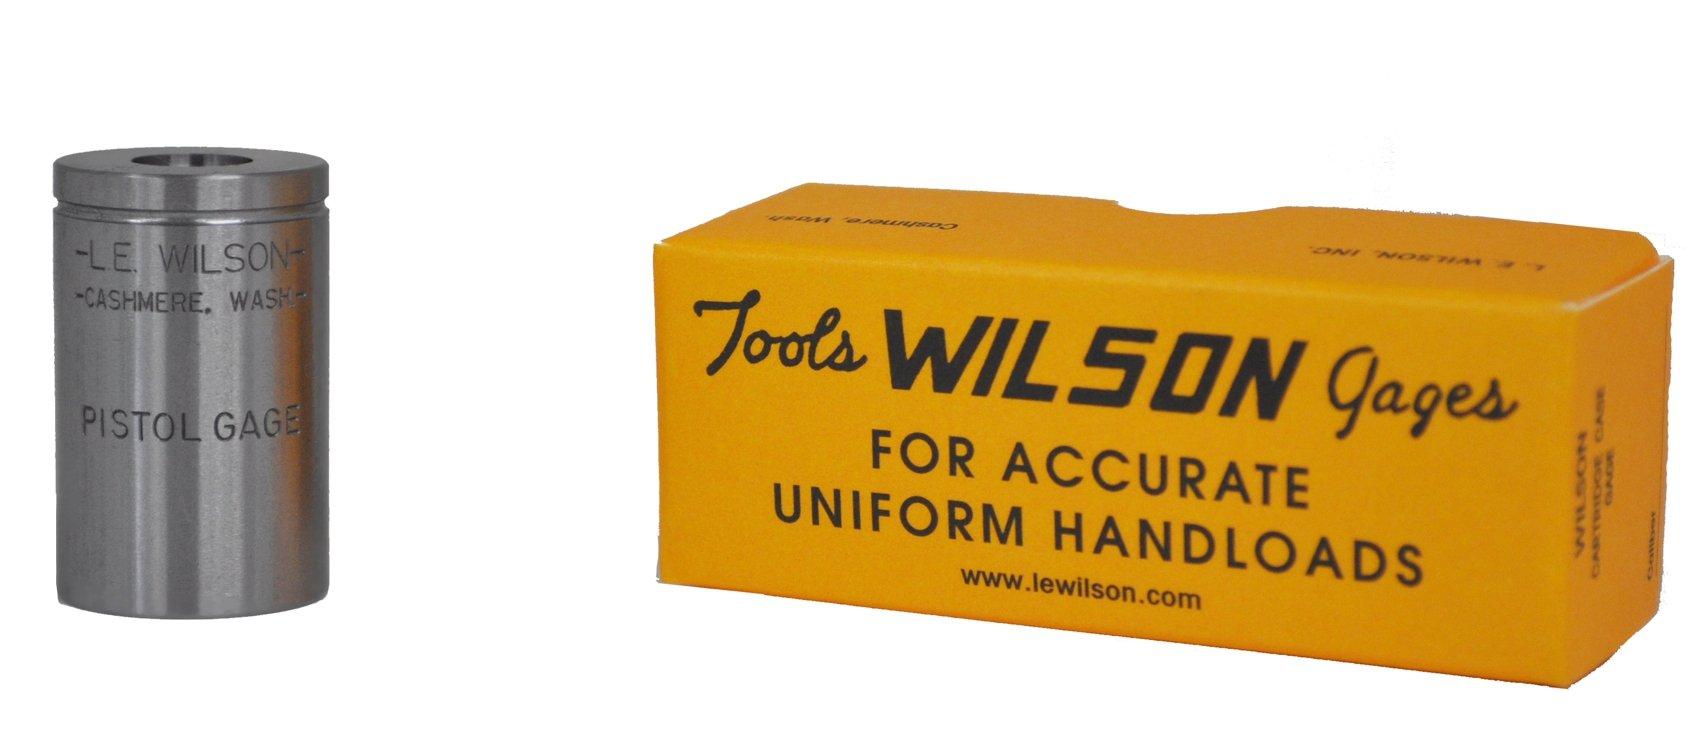 L.E. Wilson PMG-380 380 Auto Pistol Max Gage, Polished Steel